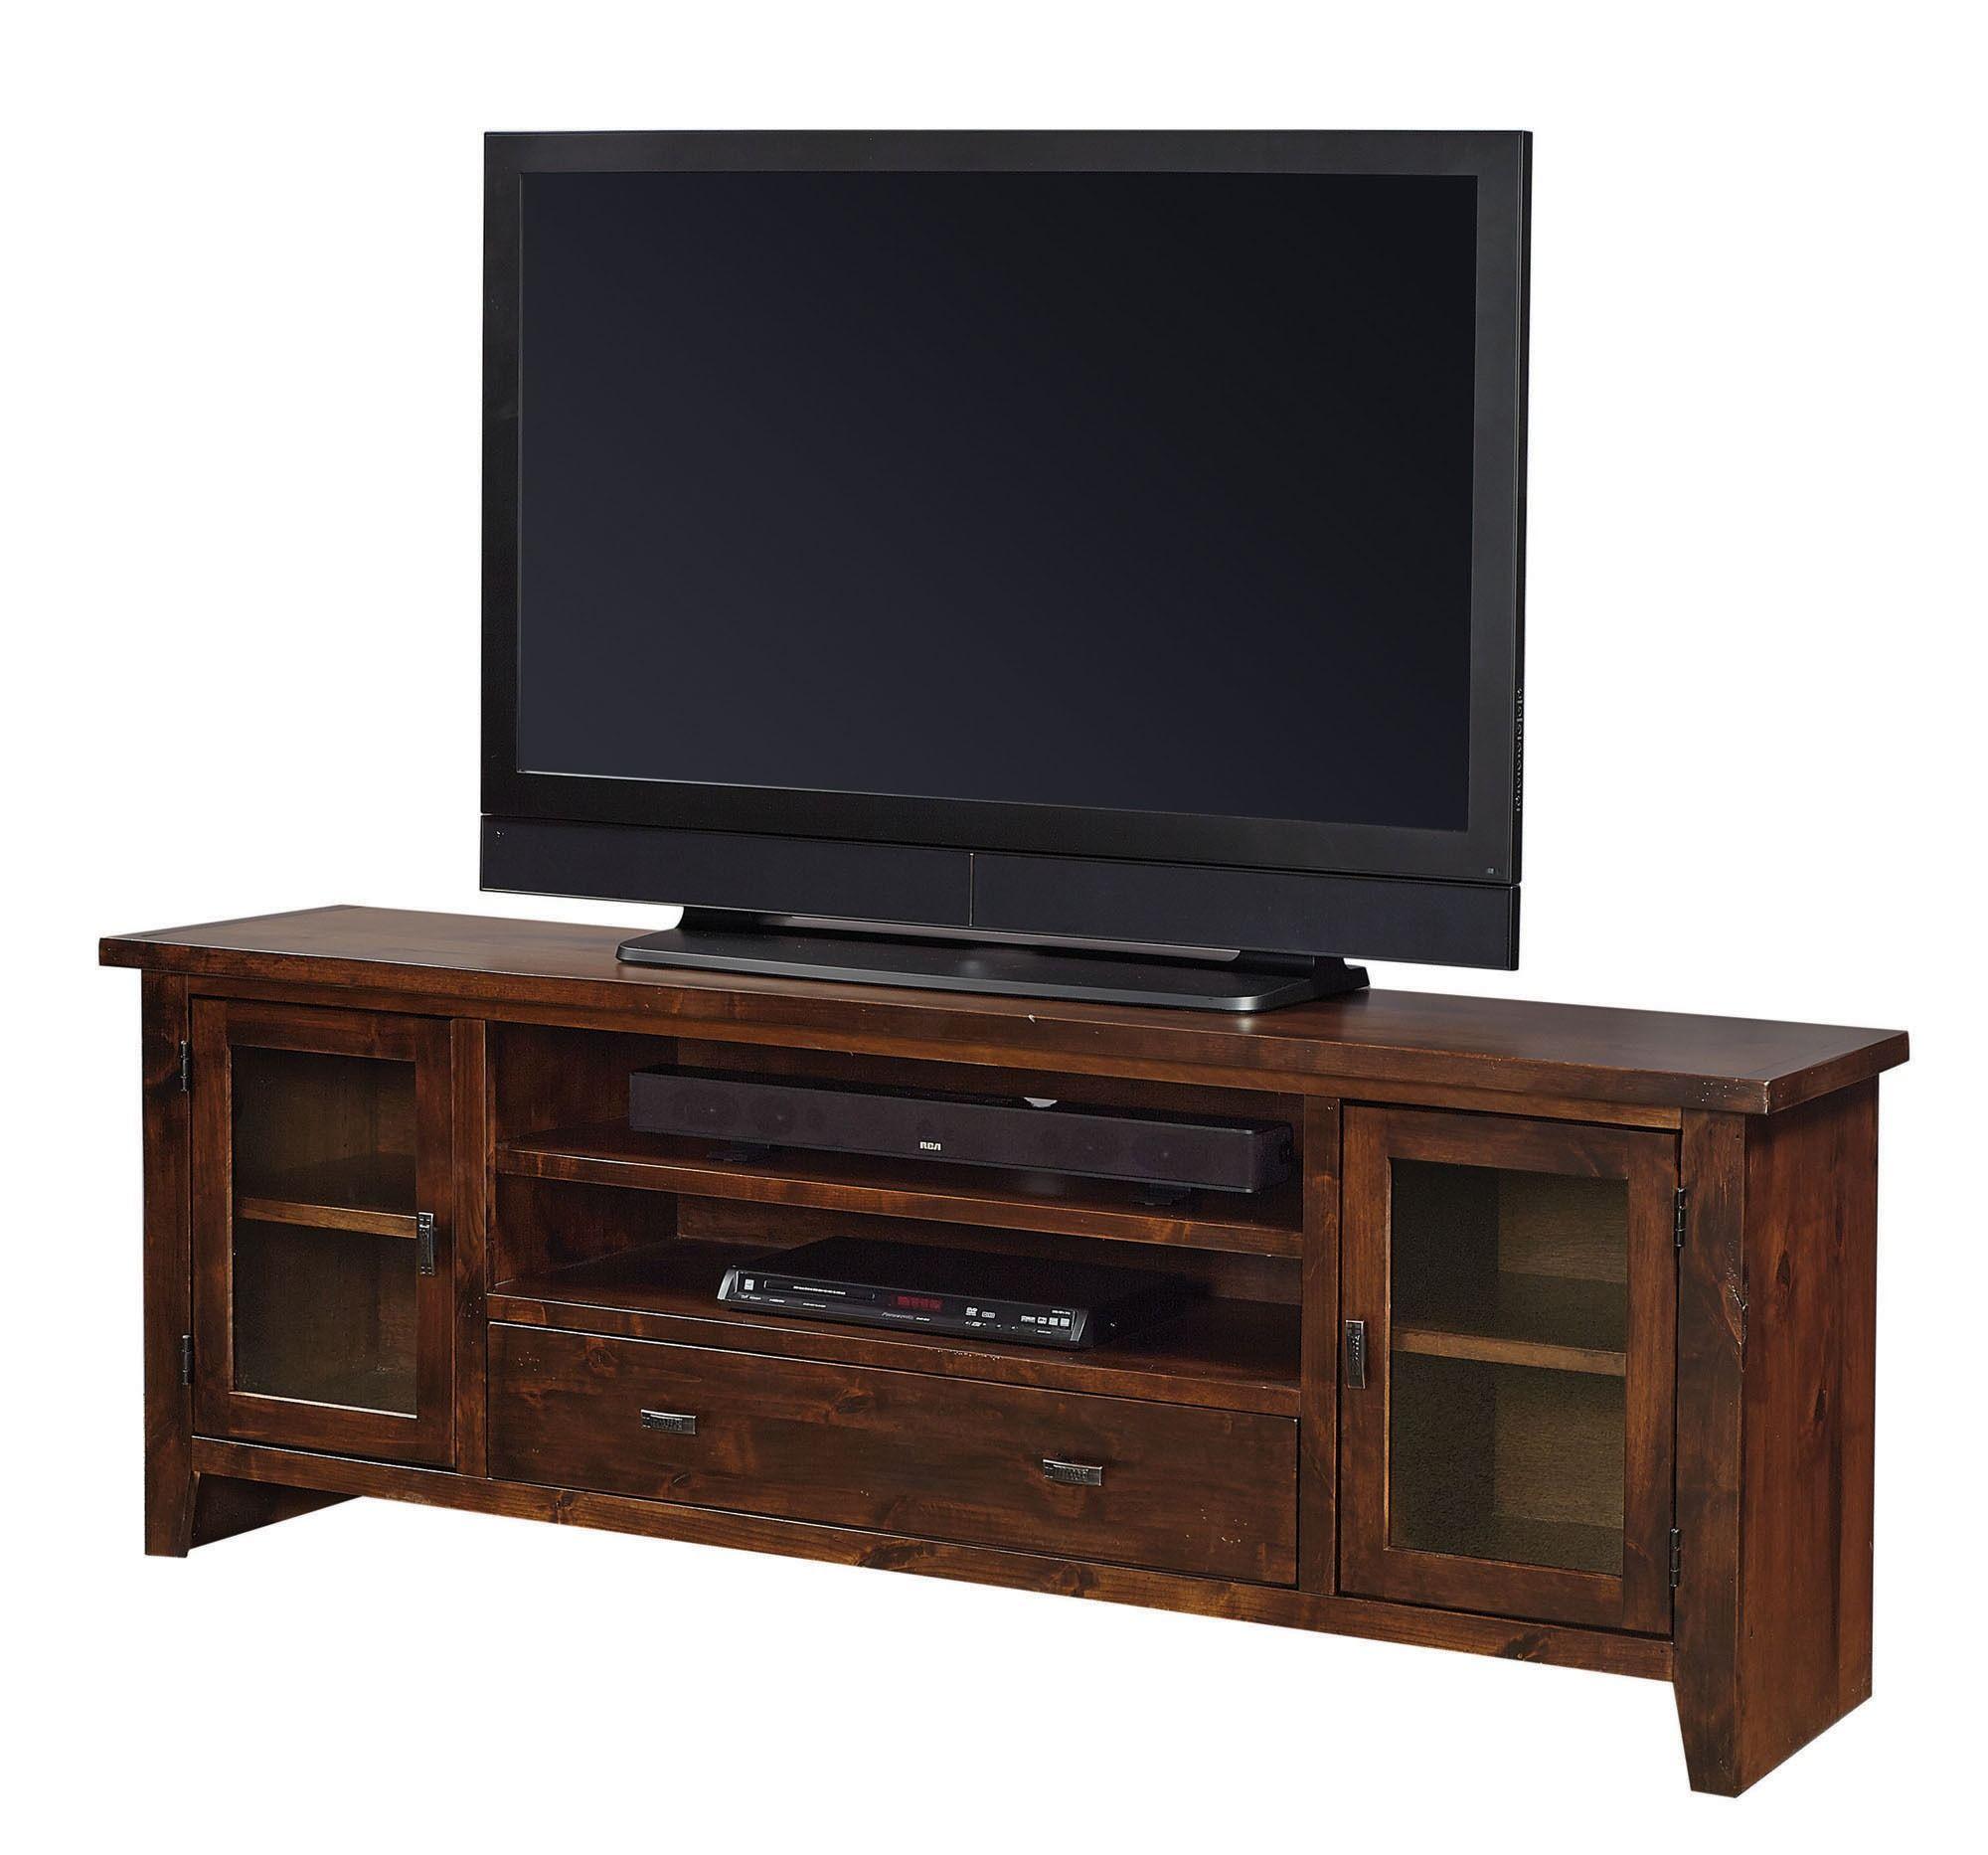 Aspen home consoles aspen and wood furniture